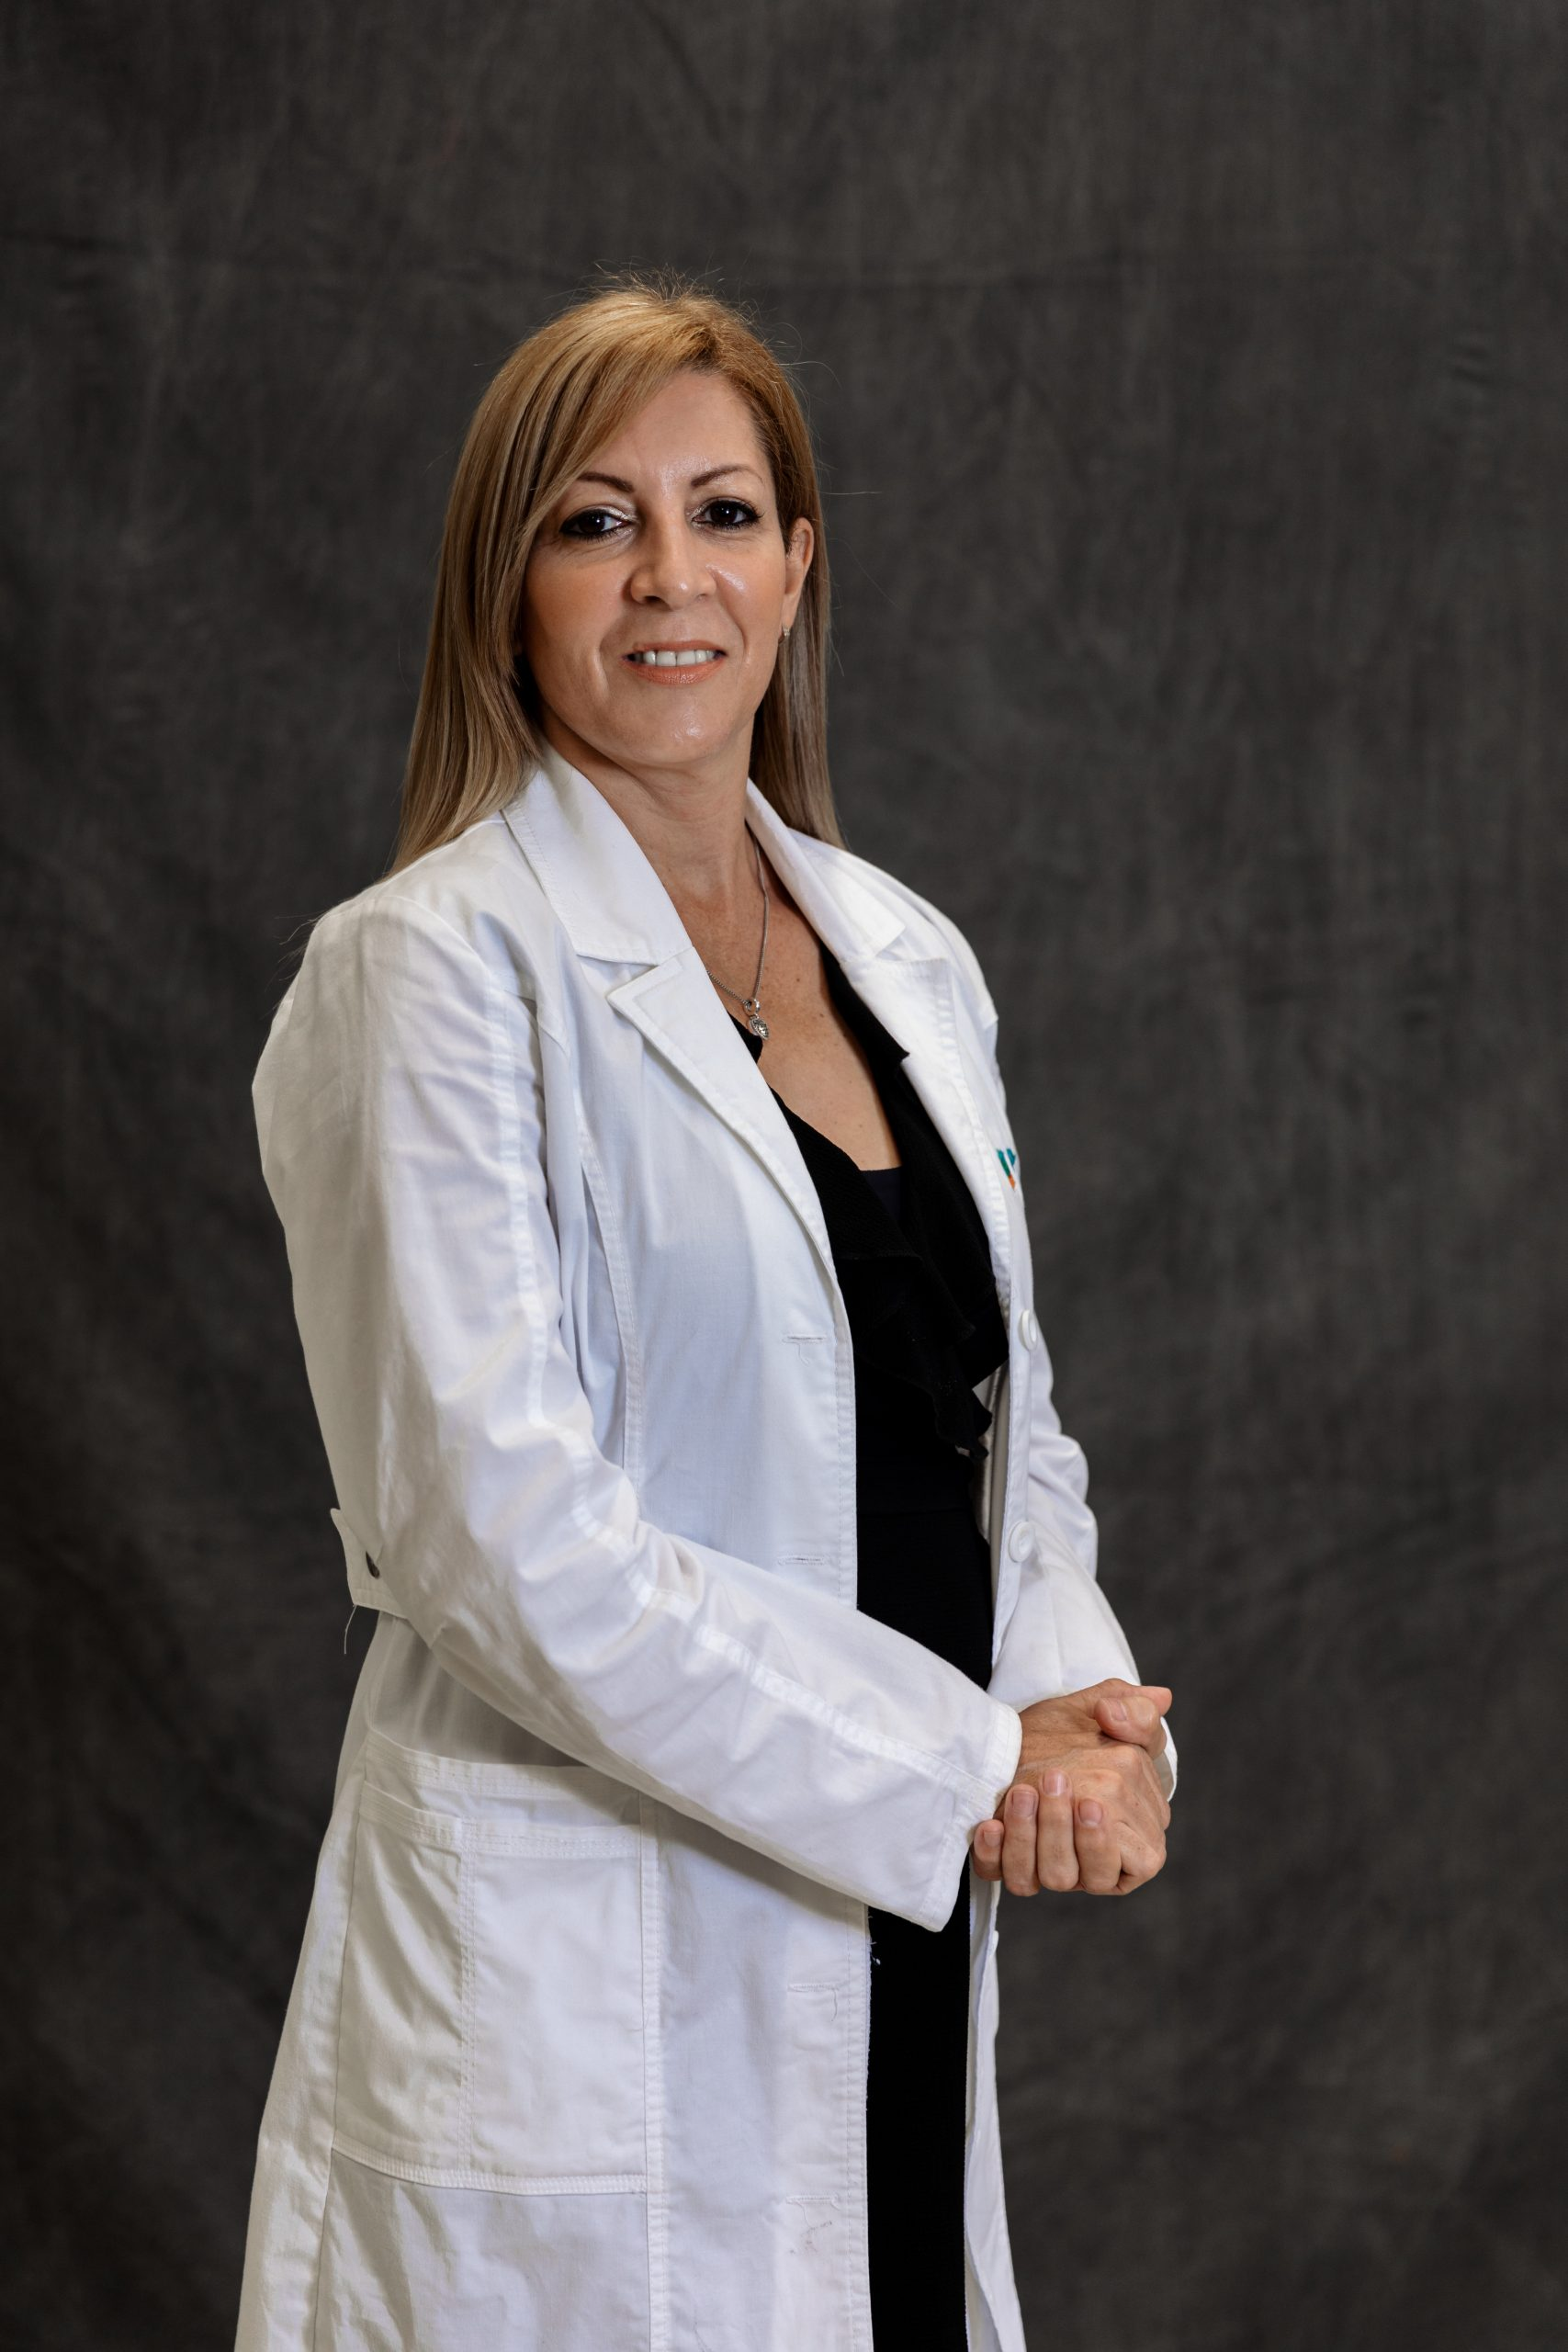 Dra. Idalia Colon